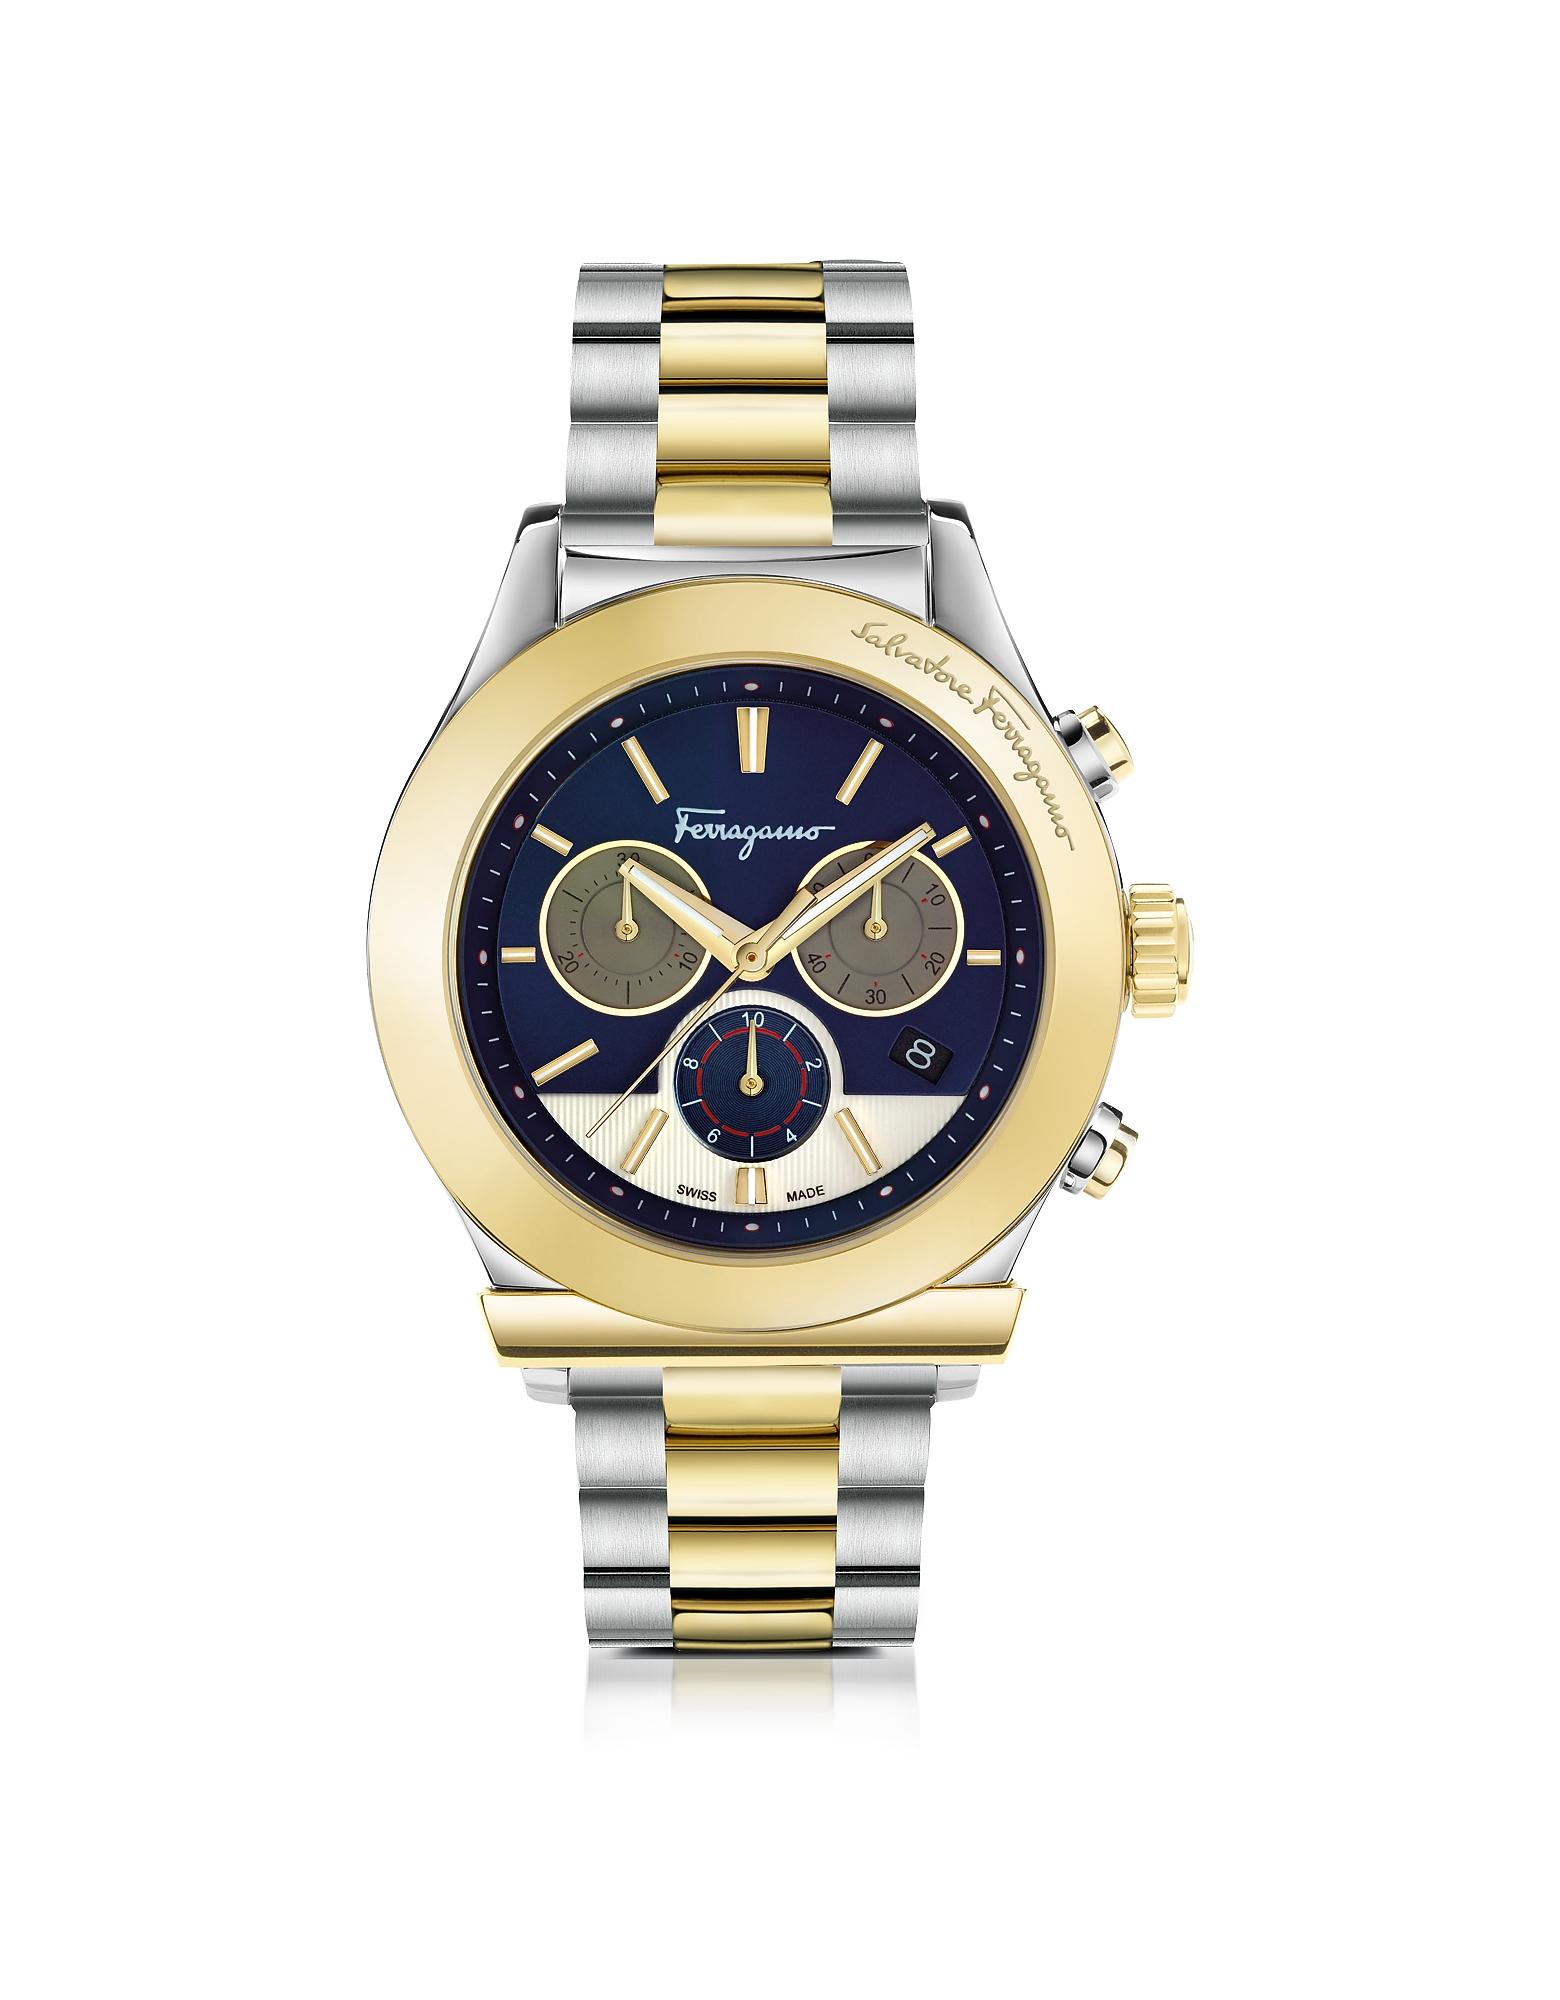 Salvatore Ferragamo Men's Watches, Ferragamo 1898 Stainless Steel and Gold IP Men's Chronograph Watc